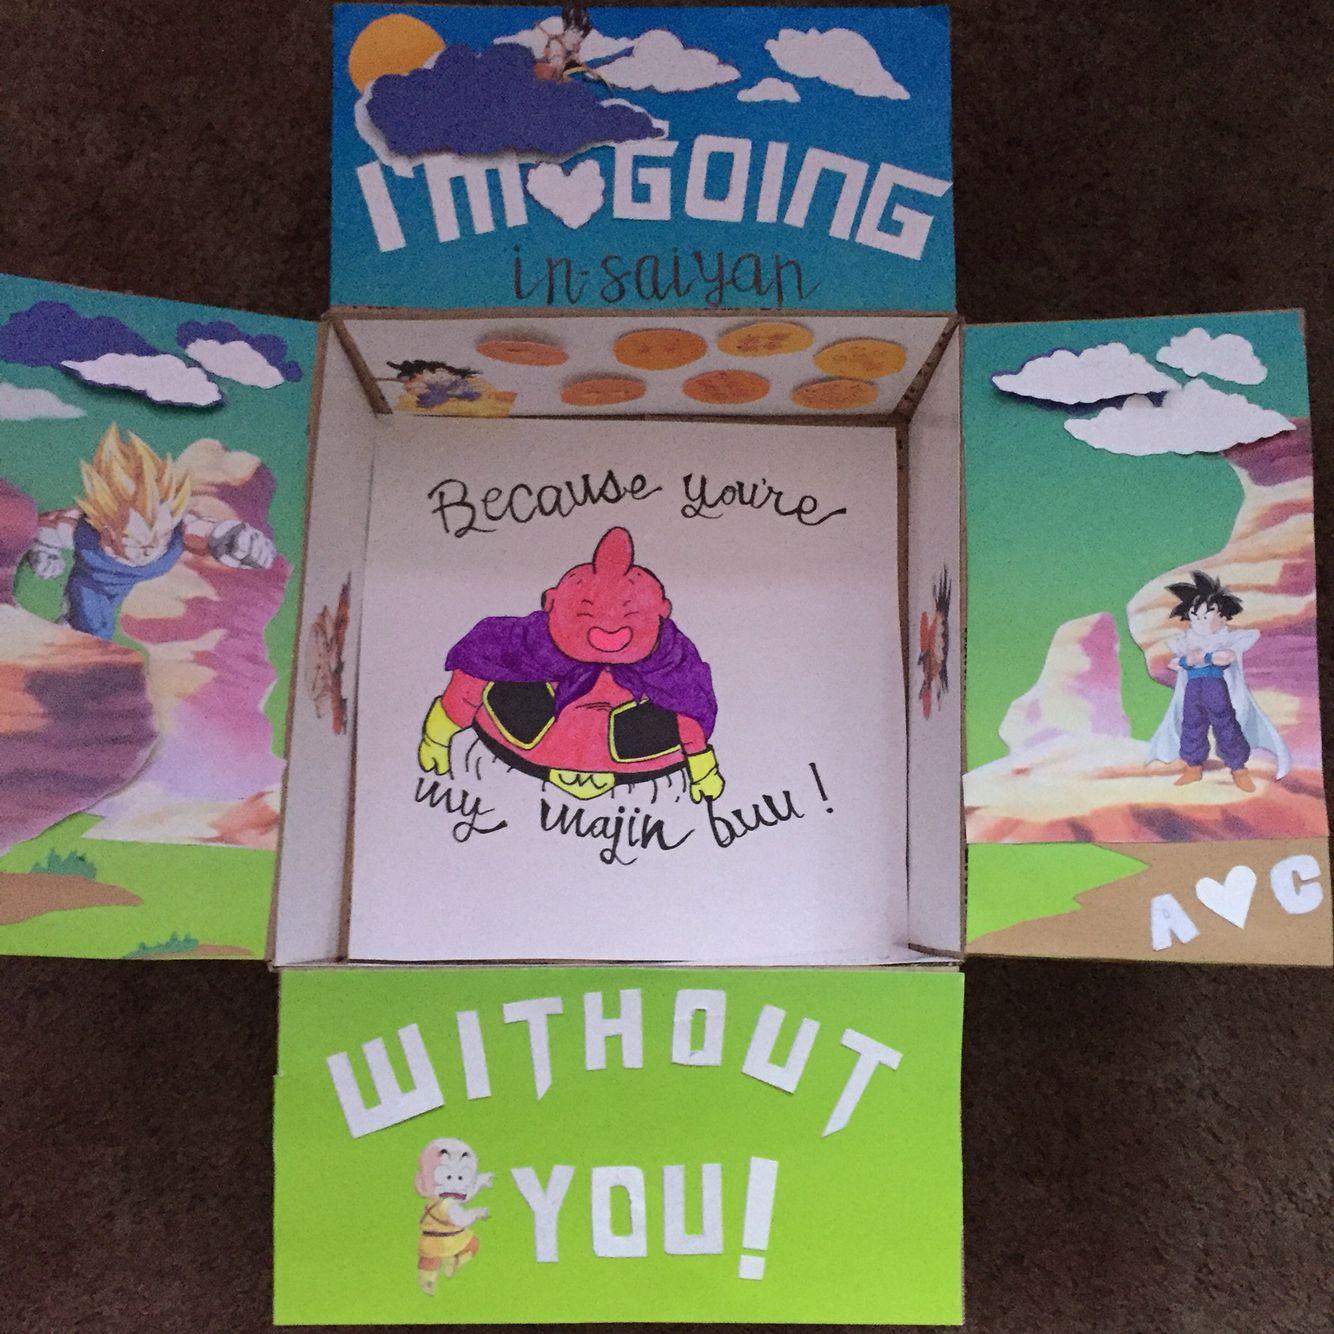 Best ideas about Dragon Ball Z Gift Ideas For Boyfriend . Save or Pin For my nerdy dragon ball z boyfriend Now.